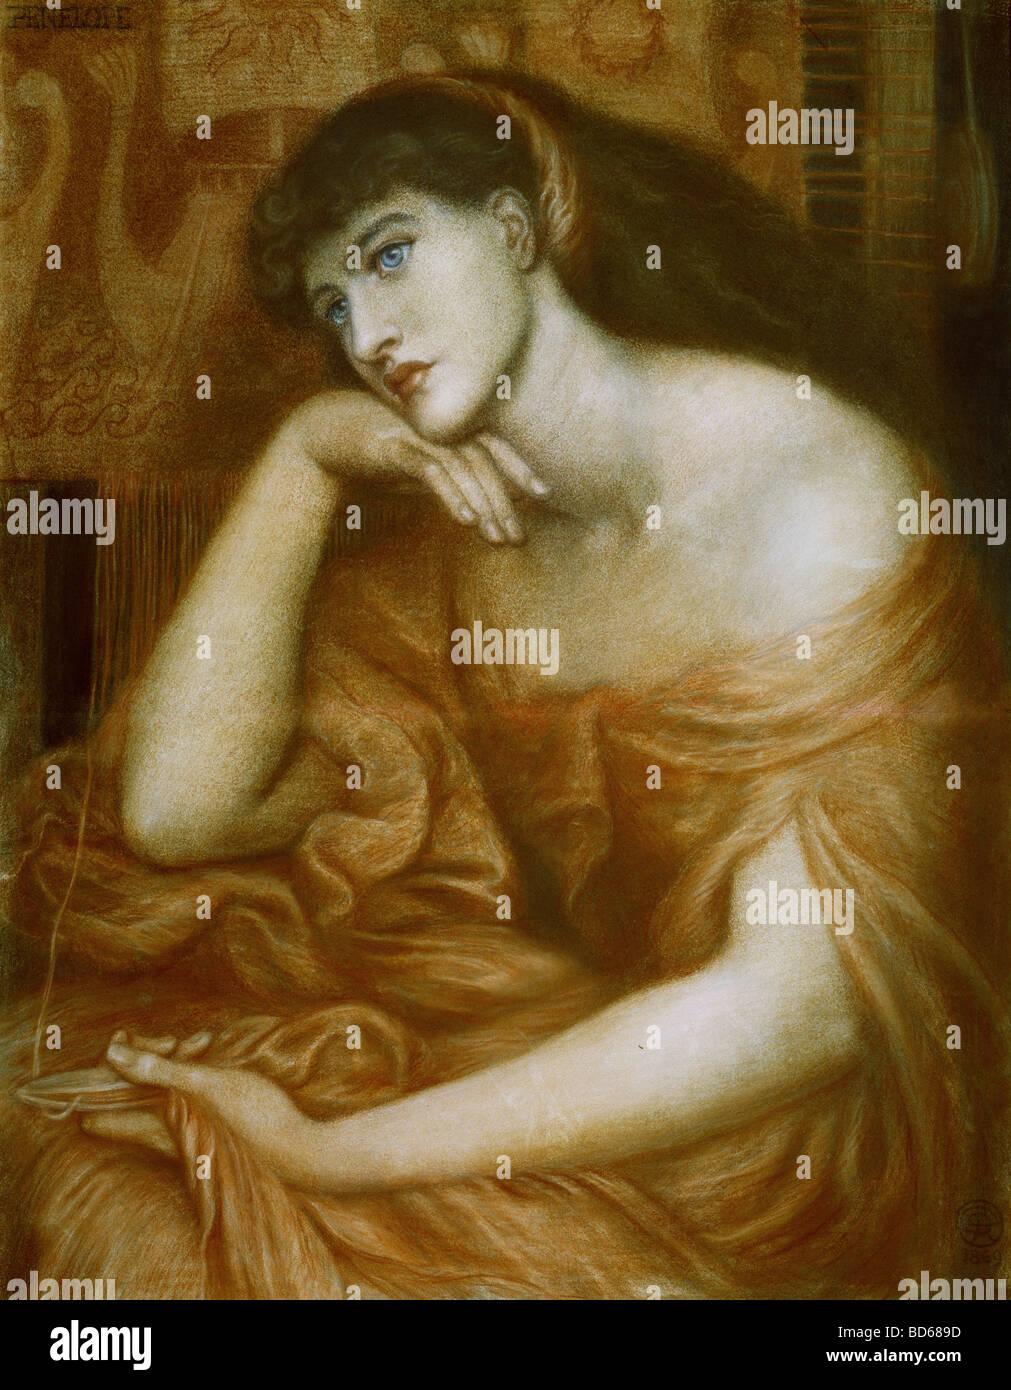 "Belle arti, Rossetti, Dante Gabriel (1828 - 1882), pittura, ""Penelope"", olio su tela, 1869, simbologia, Immagini Stock"